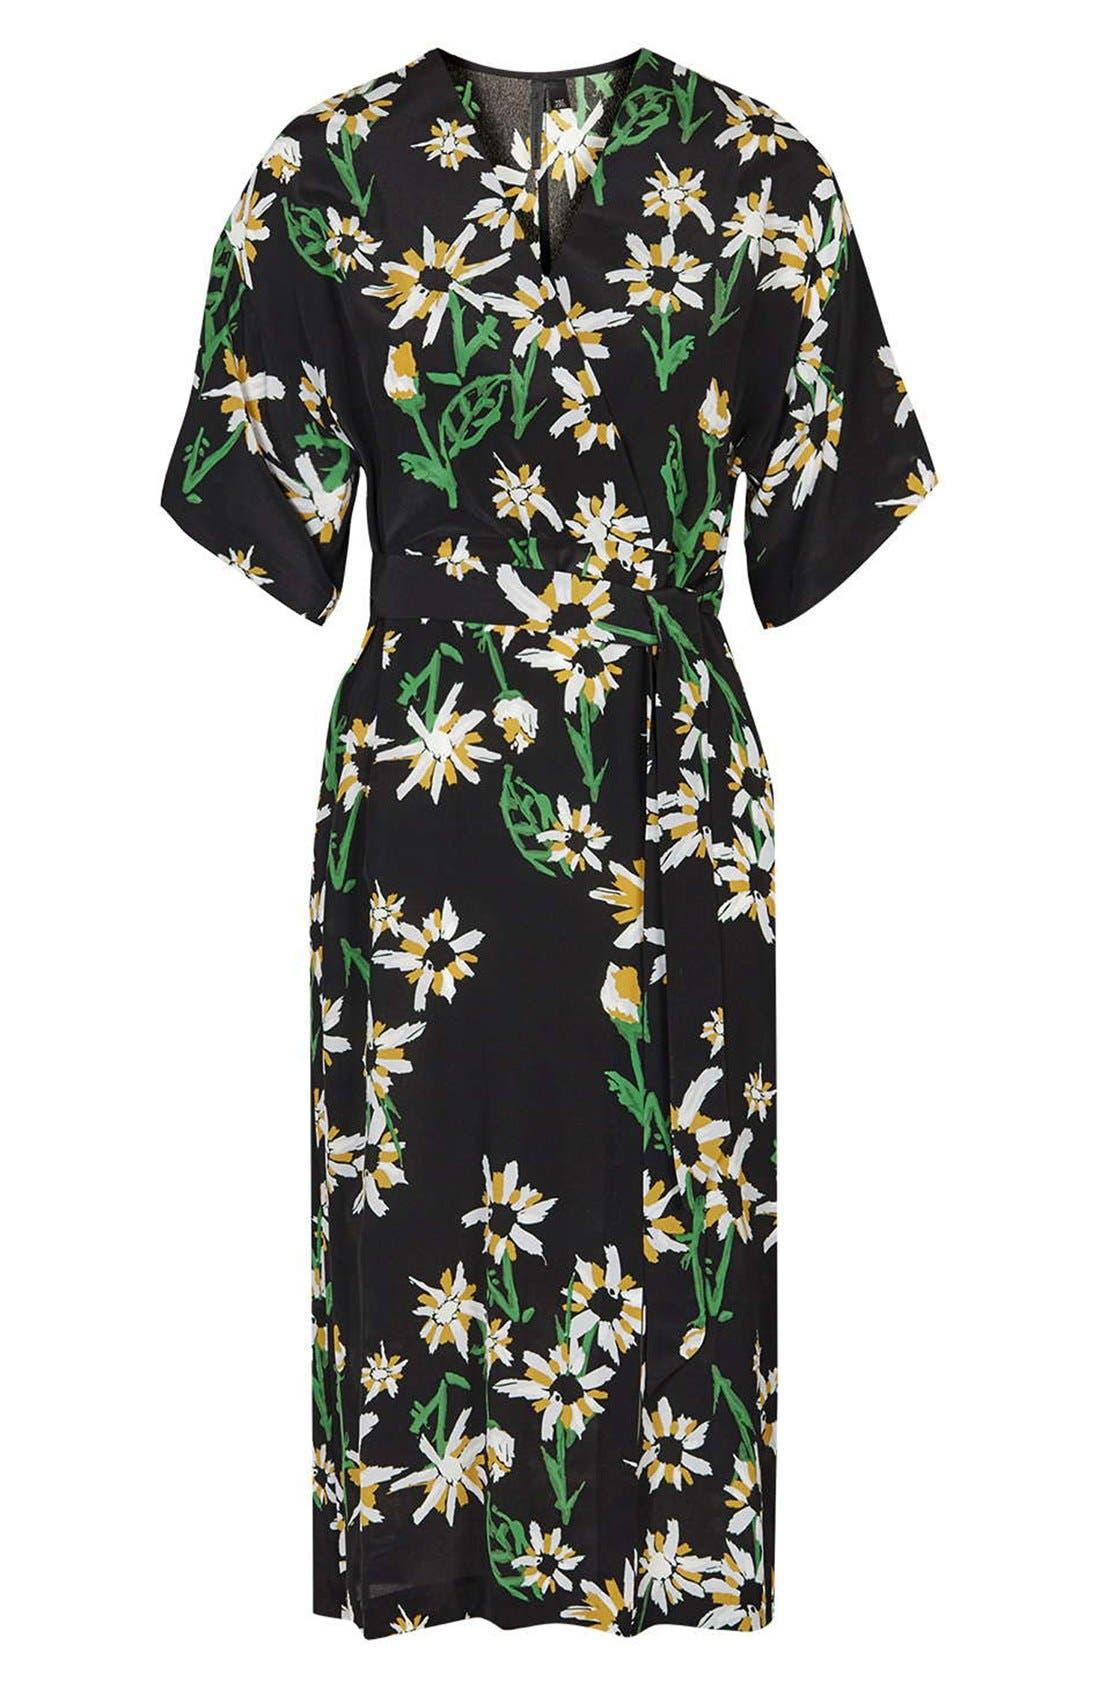 TOPSHOP BOUTIQUE, Daisy Print Silk Kimono Dress, Alternate thumbnail 2, color, 001